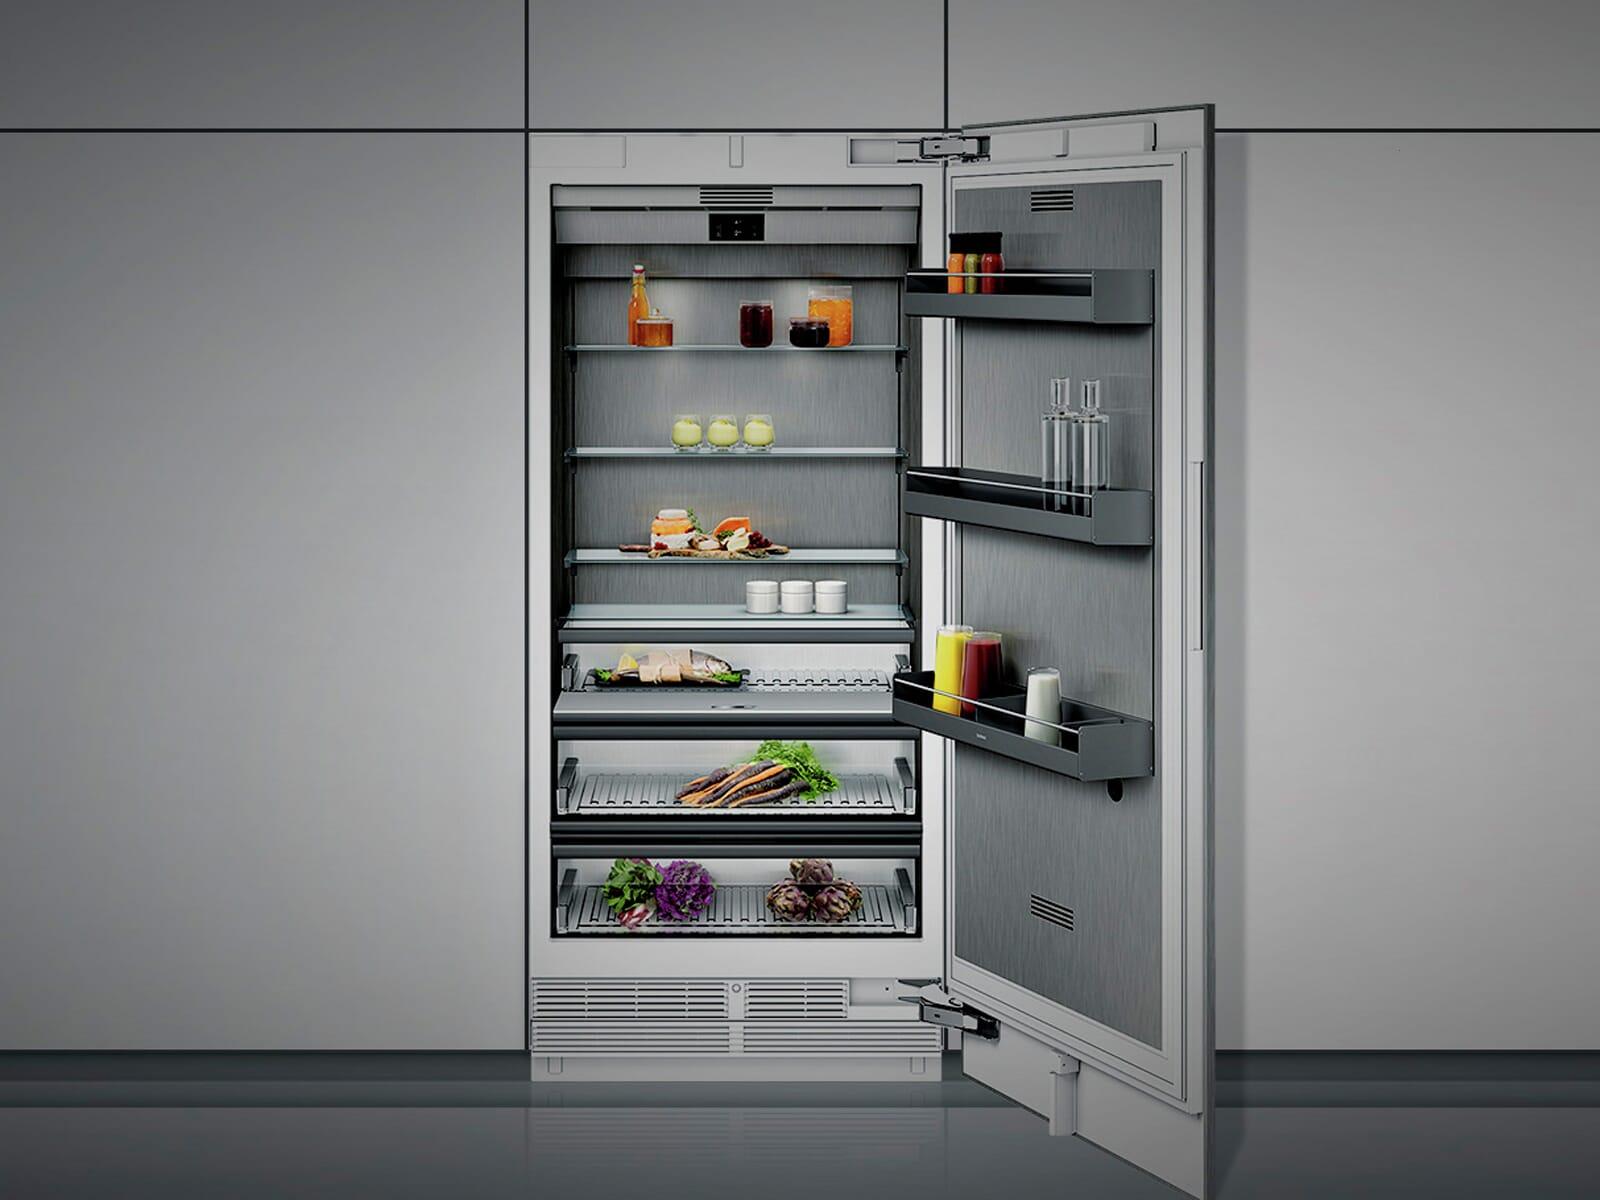 Gaggenau RC 492 304 Serie 400 Einbaukühlschrank